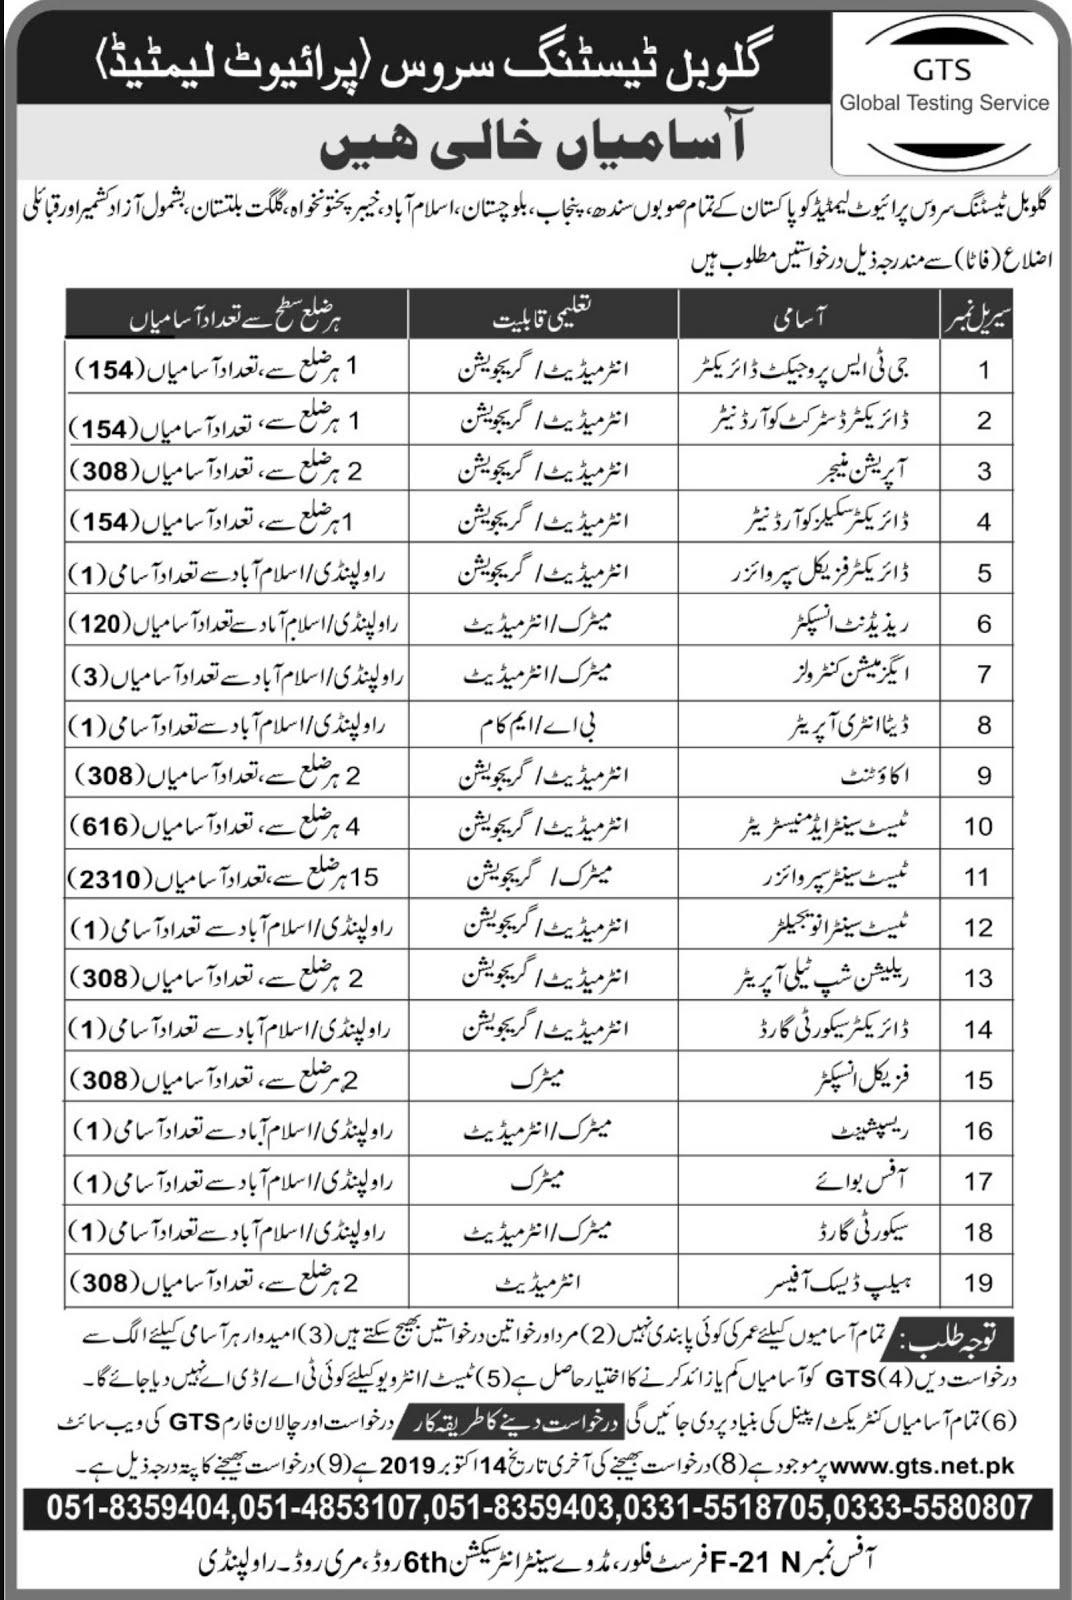 Global Testing Service GTS Jobs 2019 Pakistan